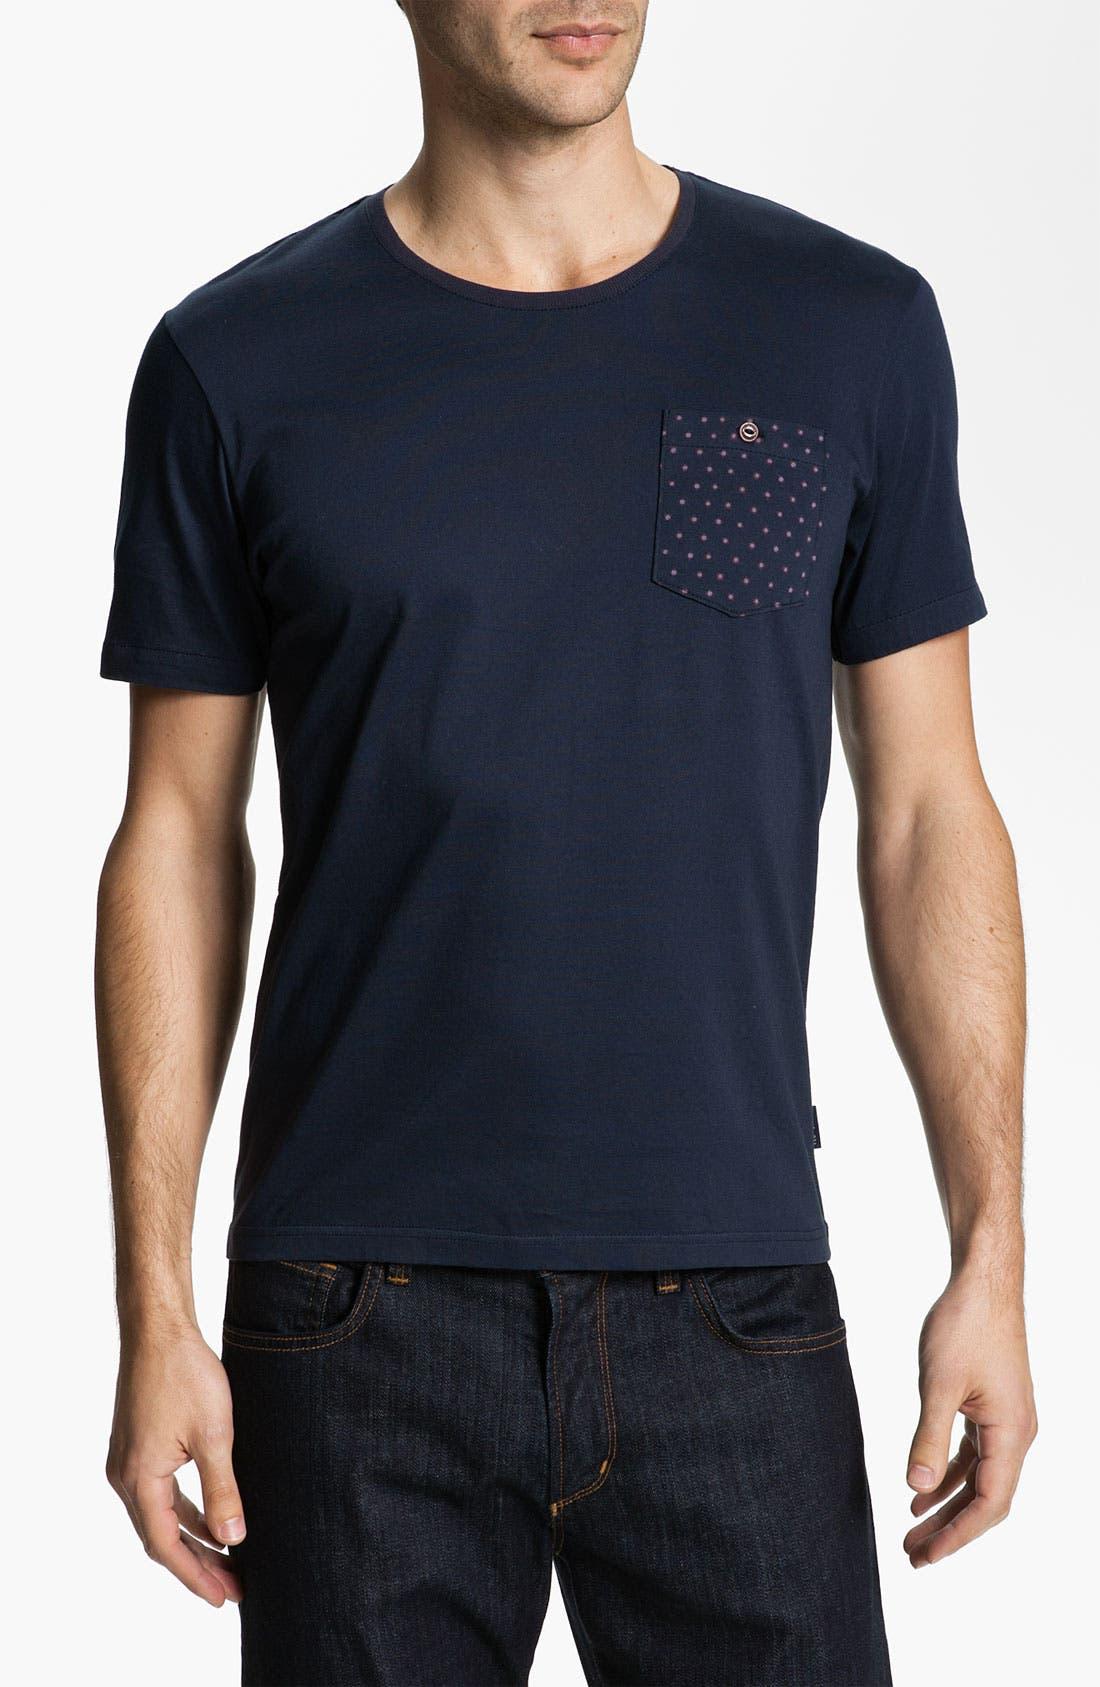 Main Image - Ted Baker London 'Nonotno' Crewneck T-Shirt